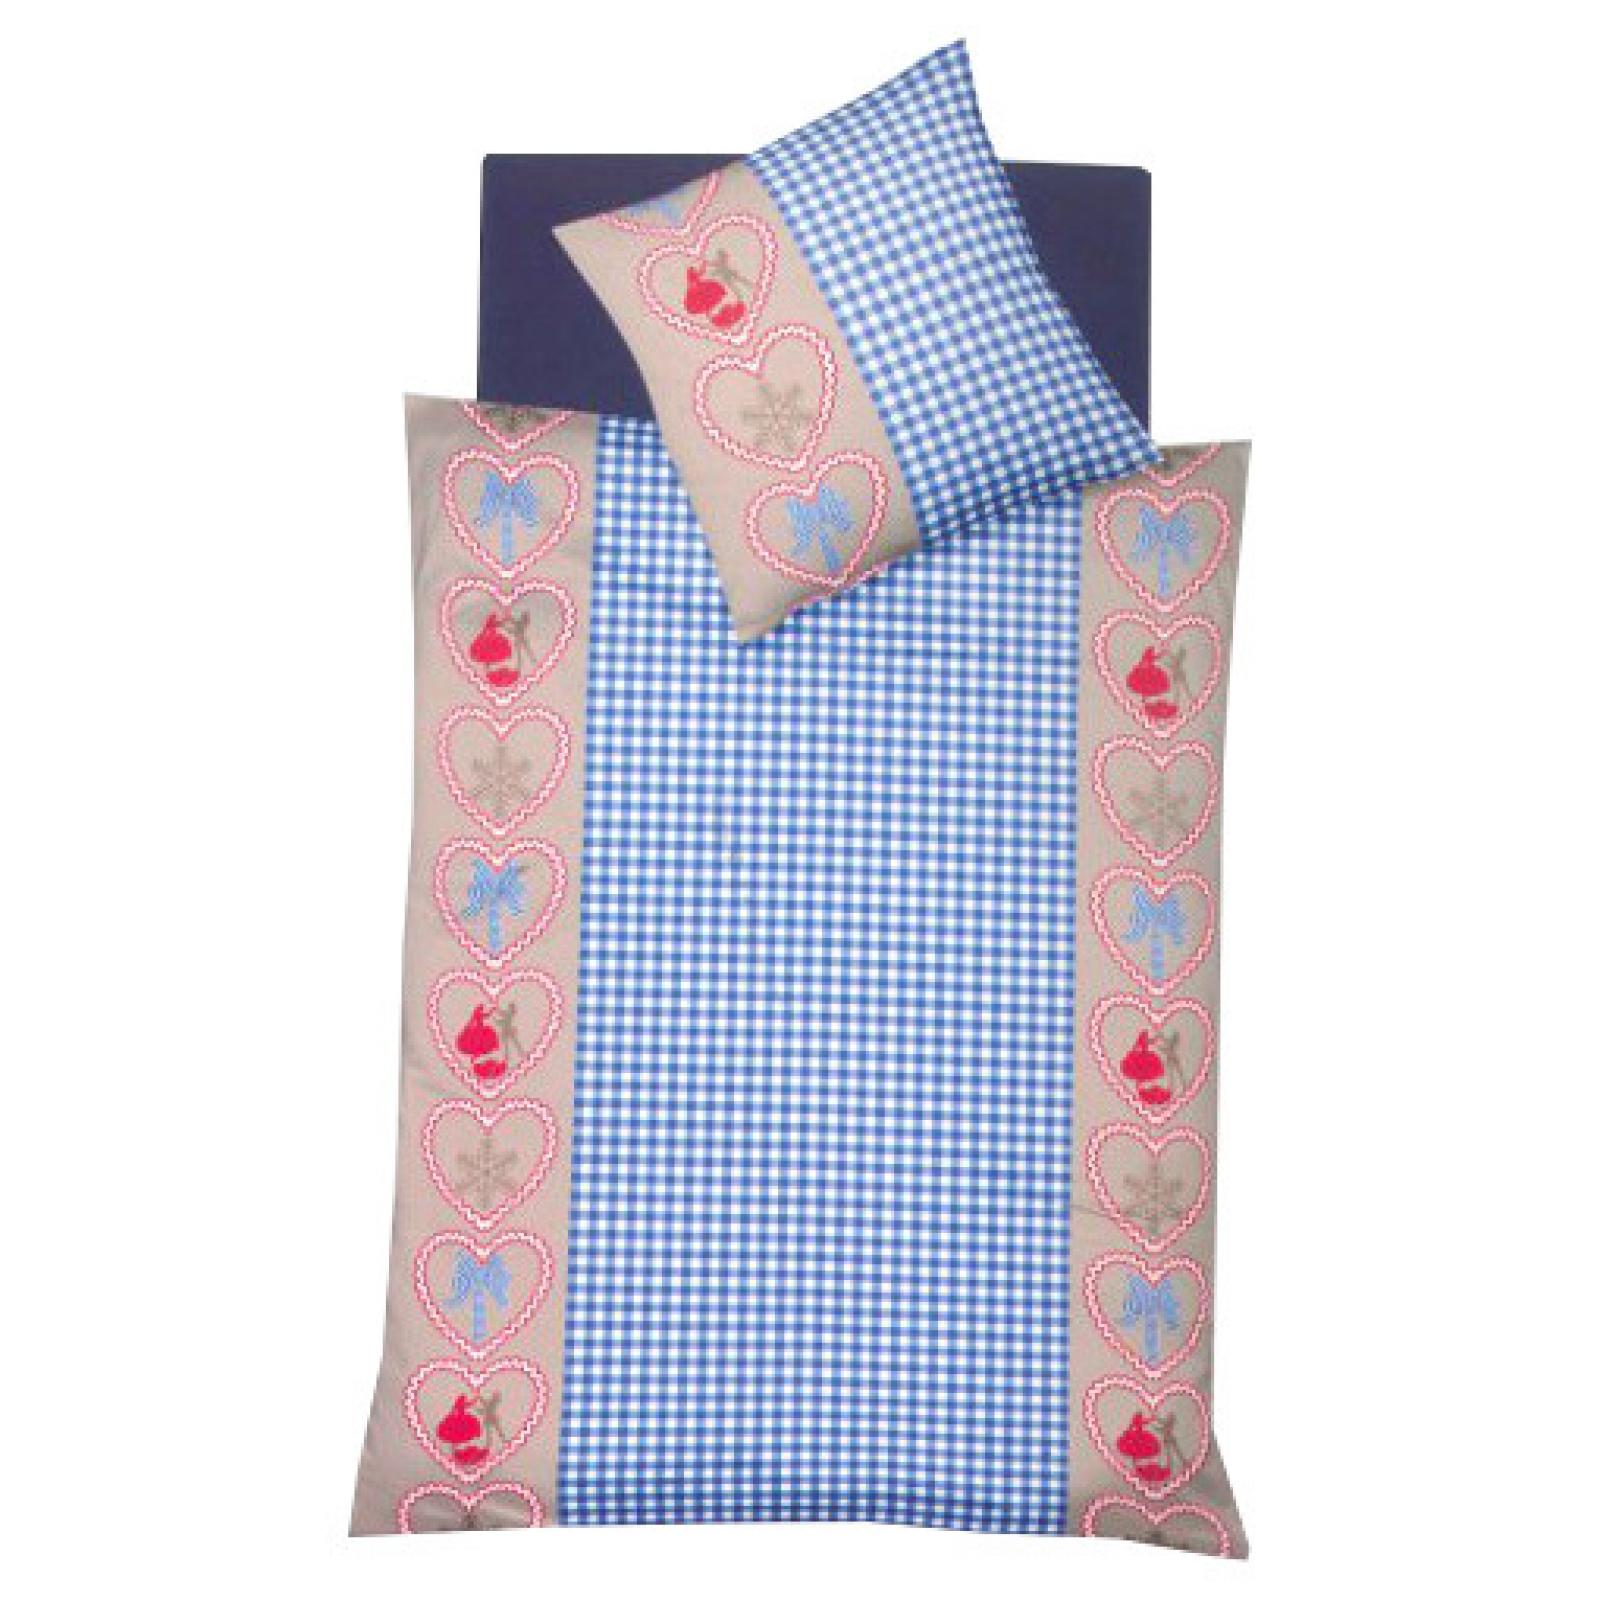 fleuresse biber bettw sche herzen blau 135x200 cm ebay. Black Bedroom Furniture Sets. Home Design Ideas